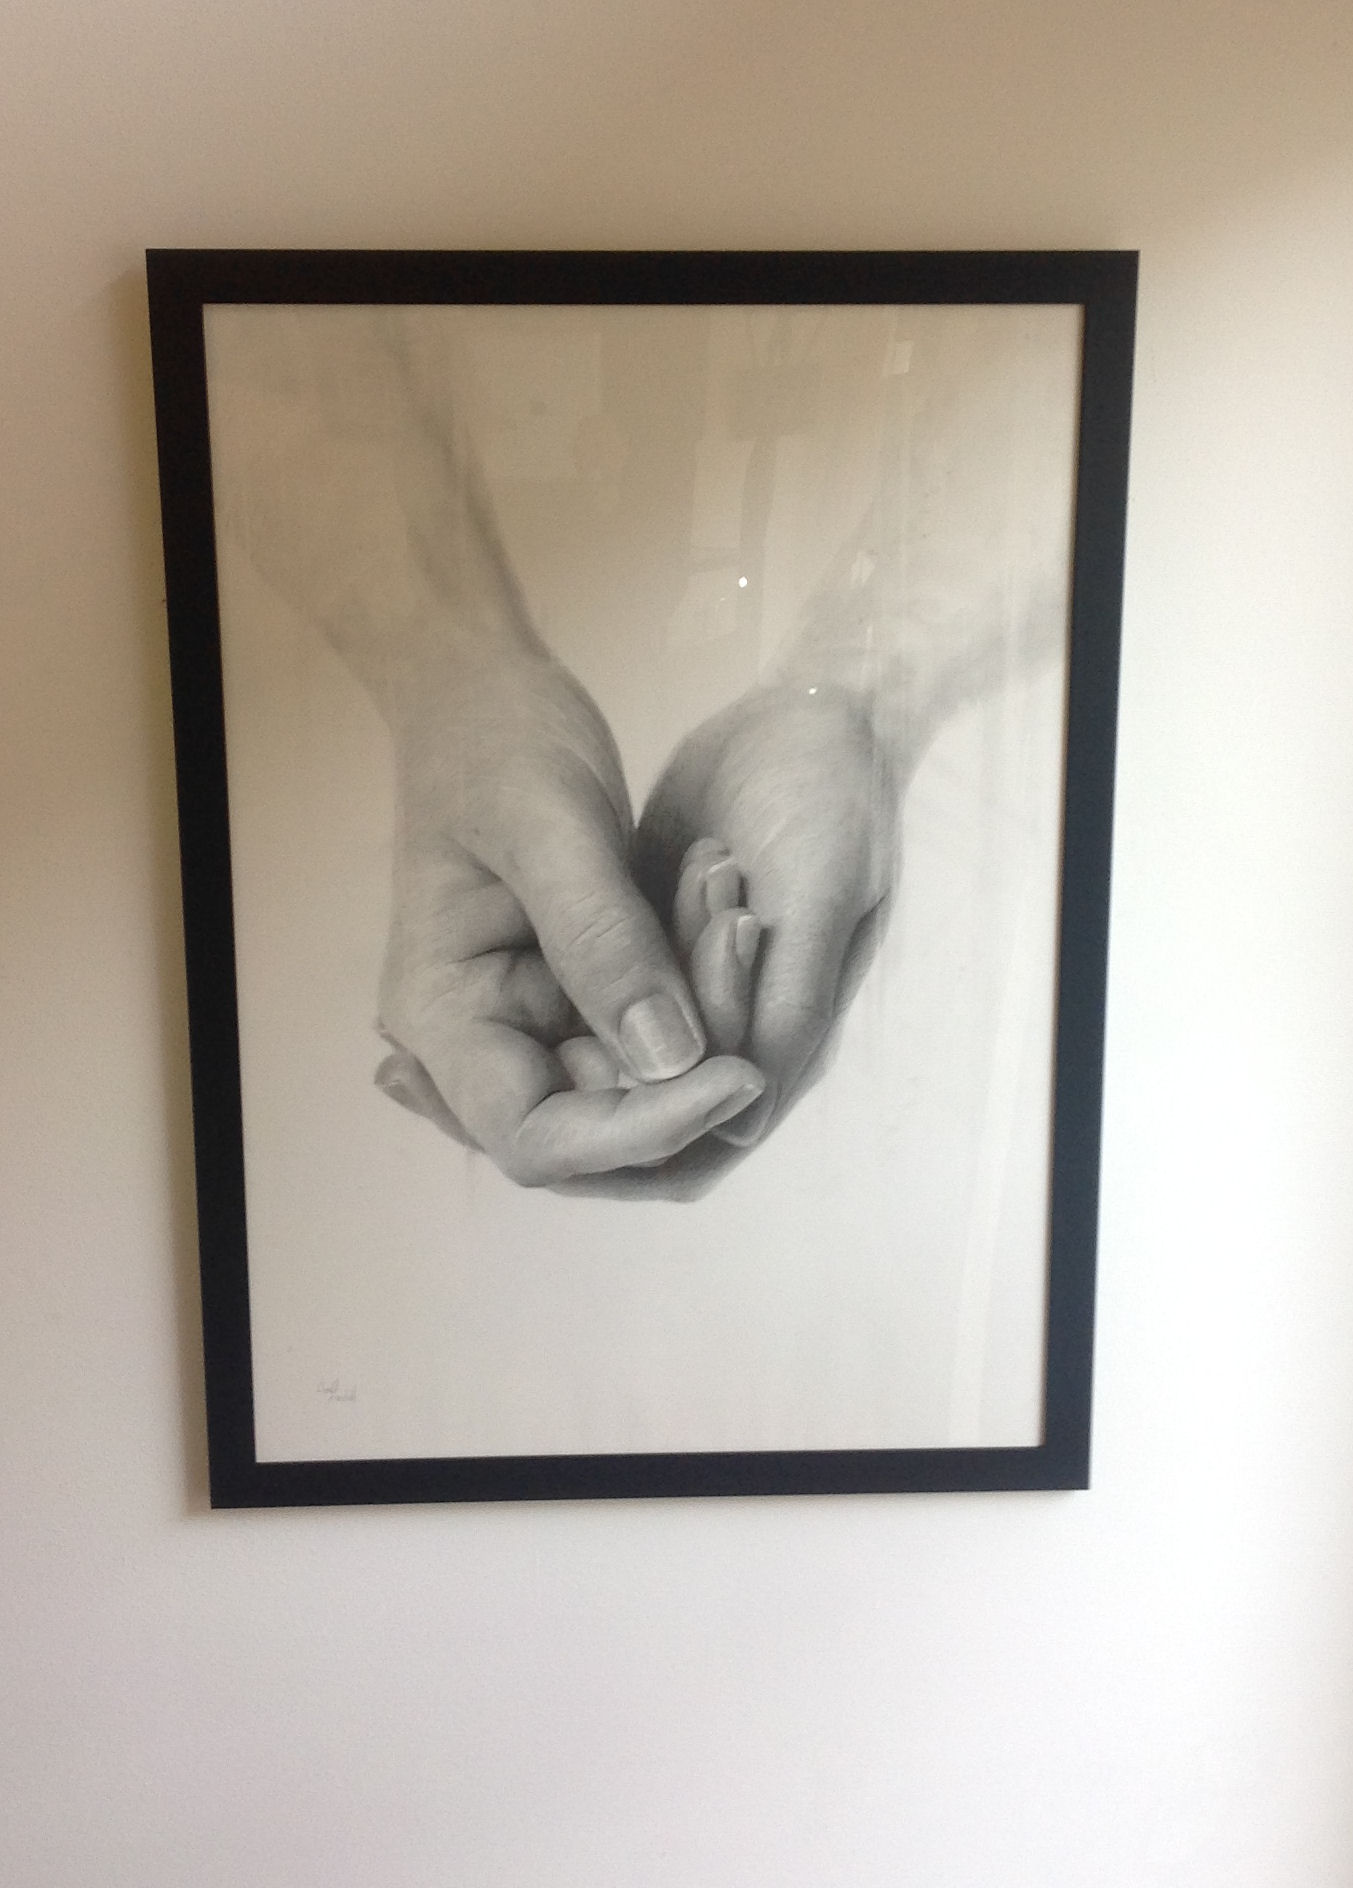 'Hand Study #1' by artist Donald Macdonald